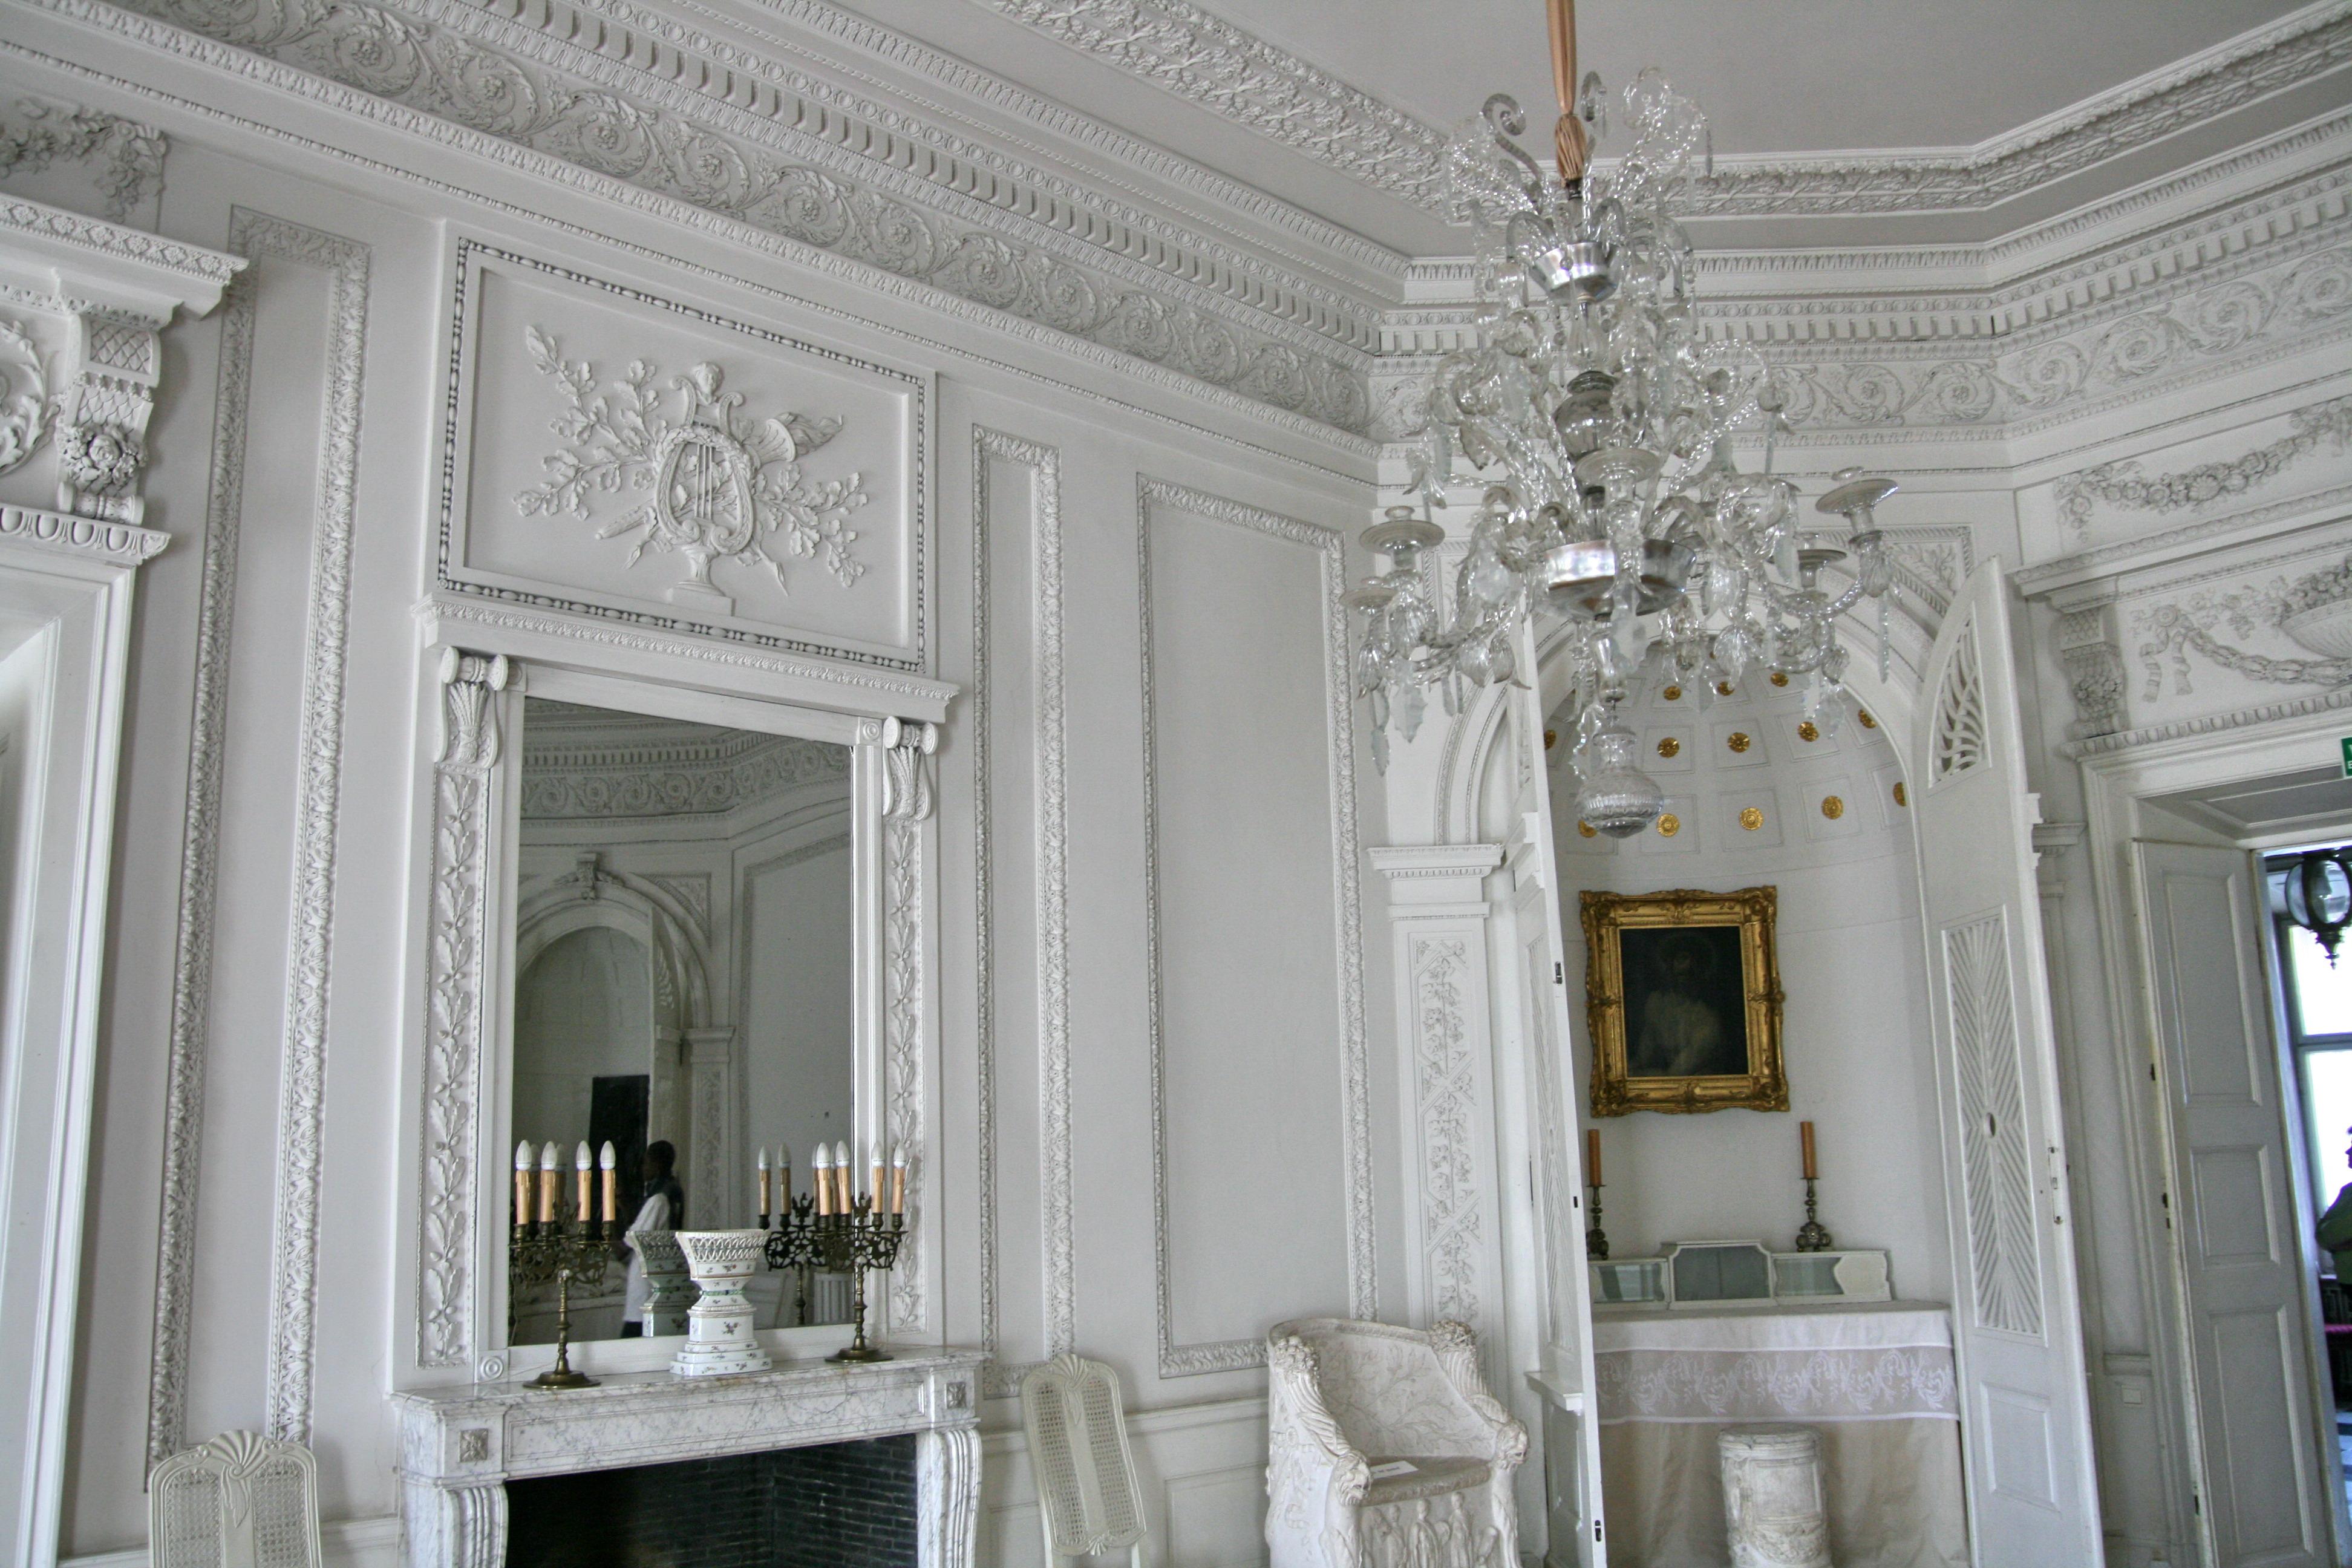 File:Nieborów Palace - The White Room.jpg - Wikimedia Commons